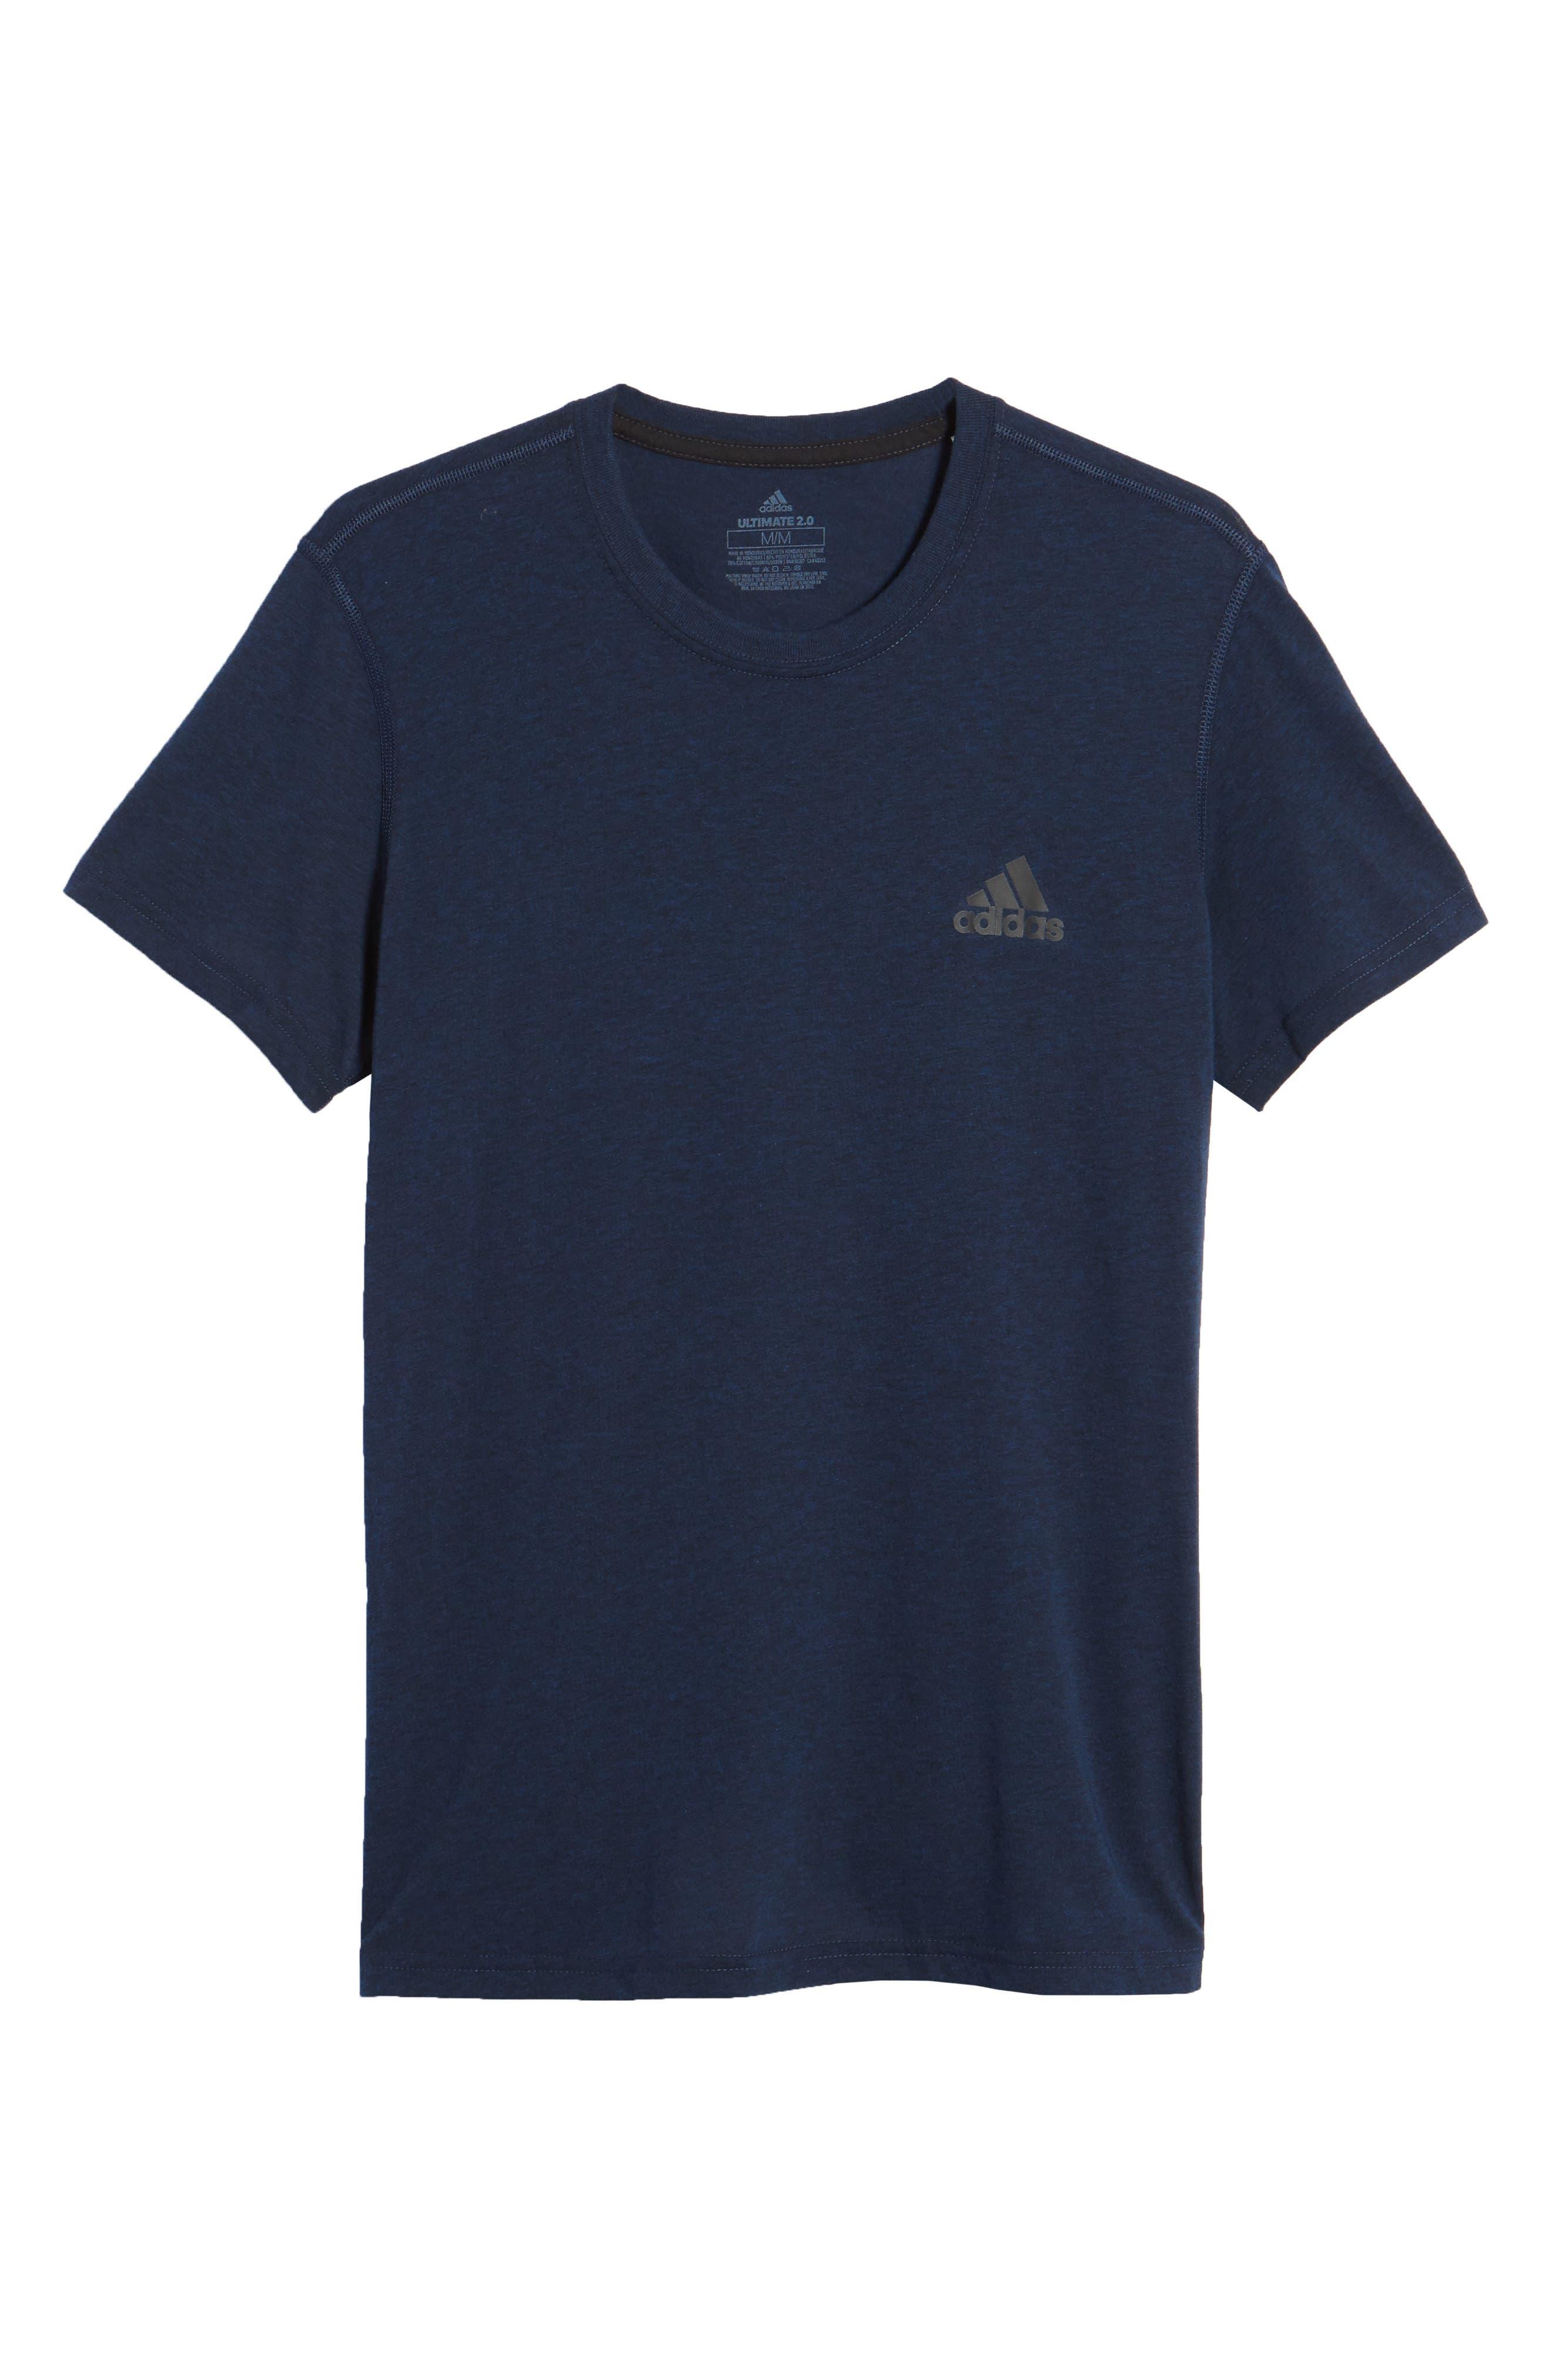 Ult Crewneck T-Shirt,                             Alternate thumbnail 6, color,                             002